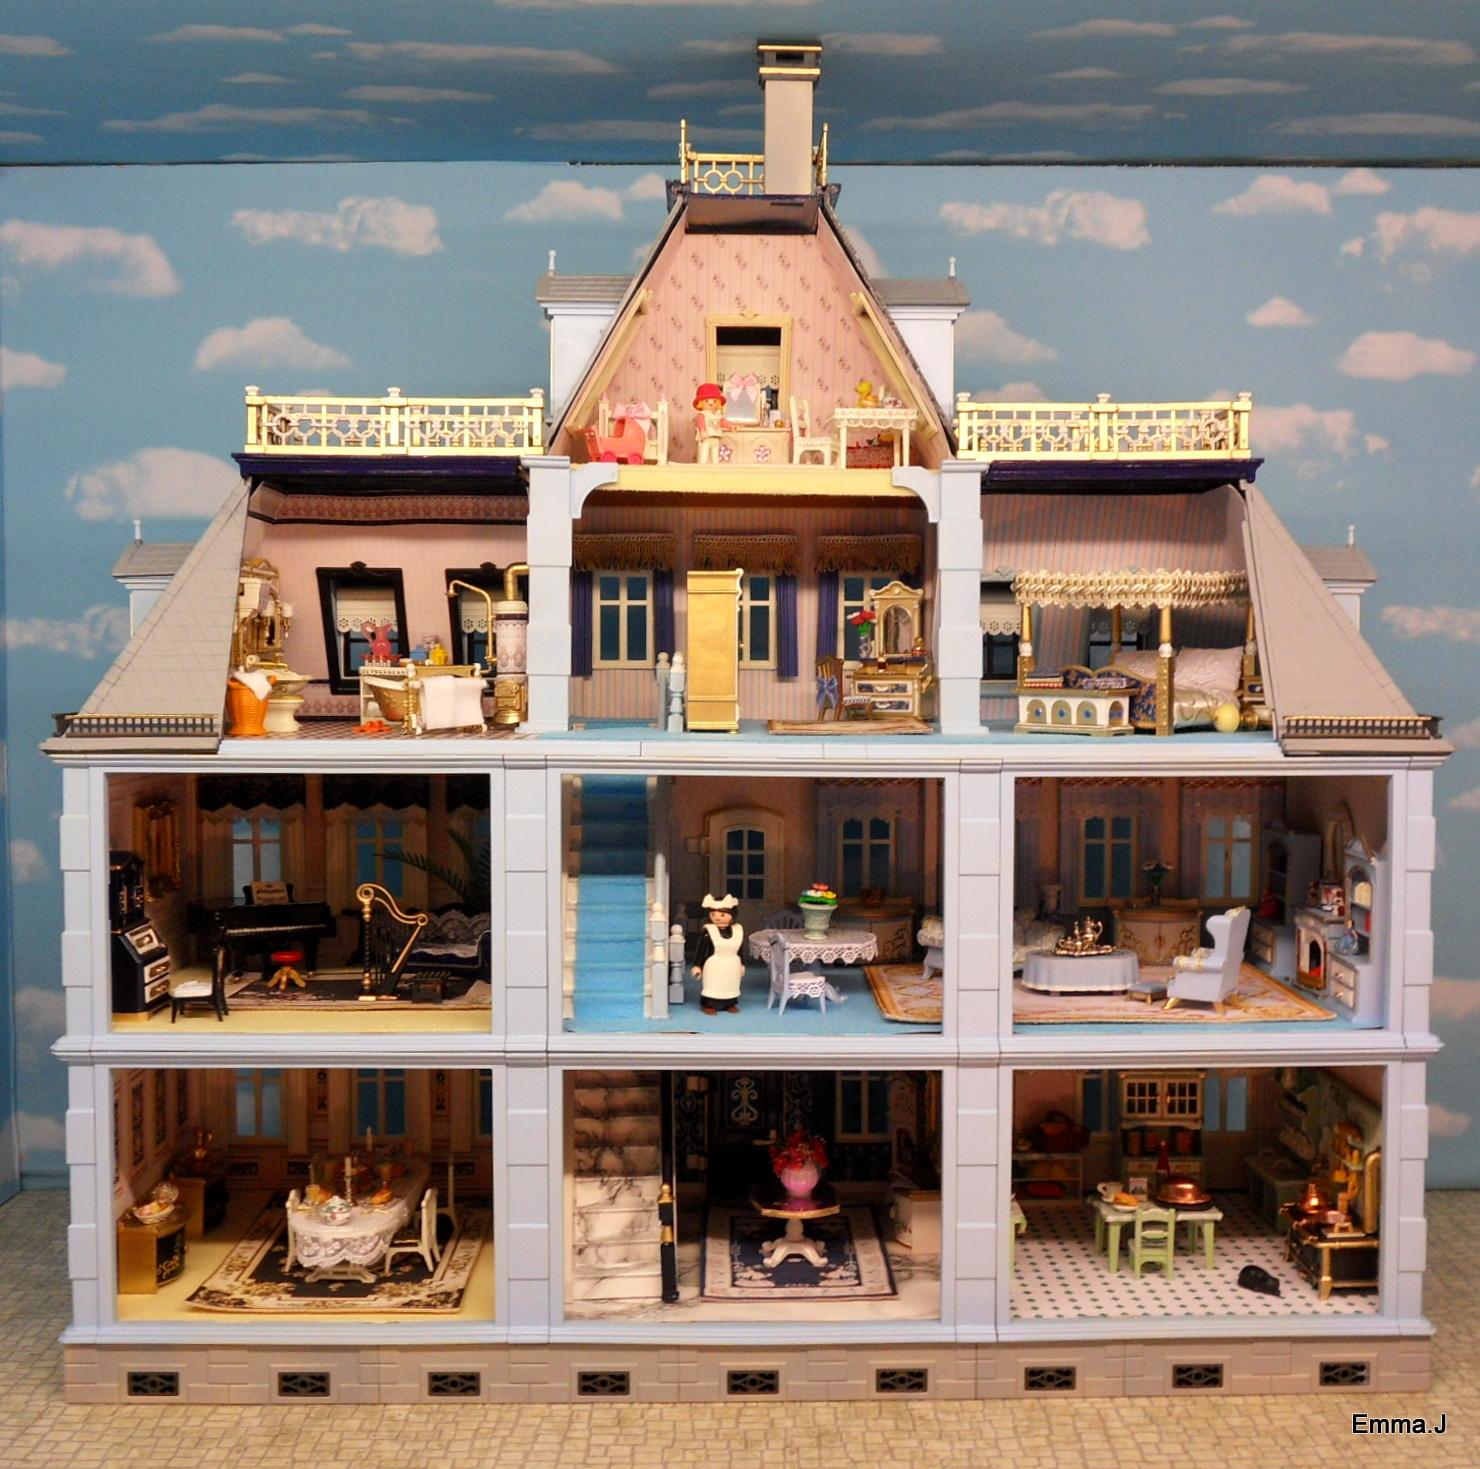 Blue Mansion EmmaJs Playmobil : SDC12539 from emma-j1066.blogspot.com size 1480 x 1469 jpeg 835kB